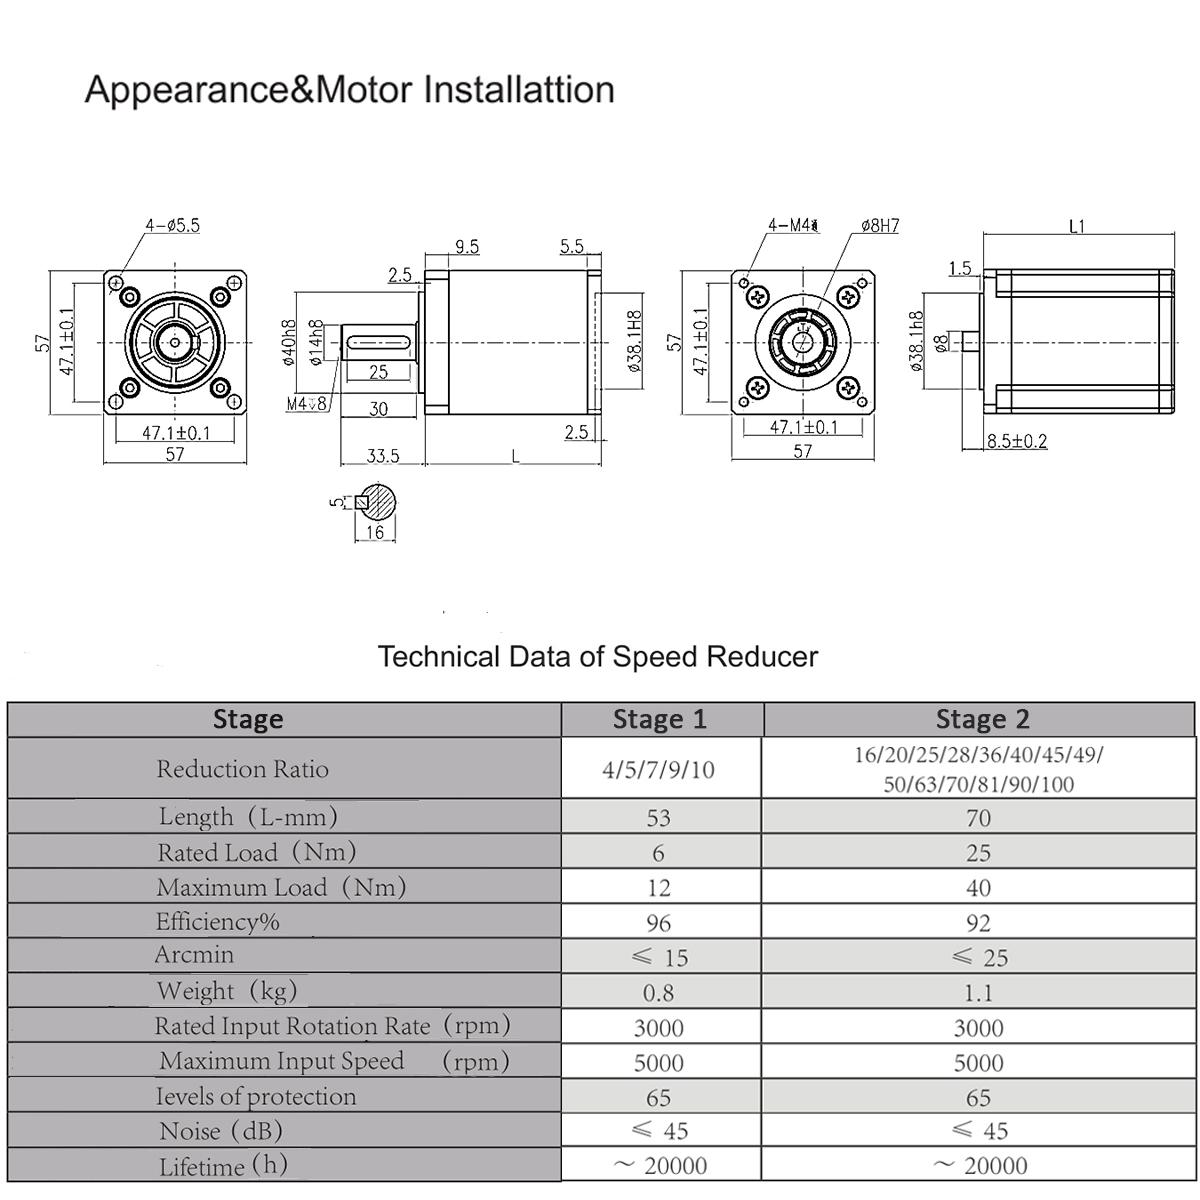 57mm Nema 23 Electric Planetary Reduction Ratio Gear Motor